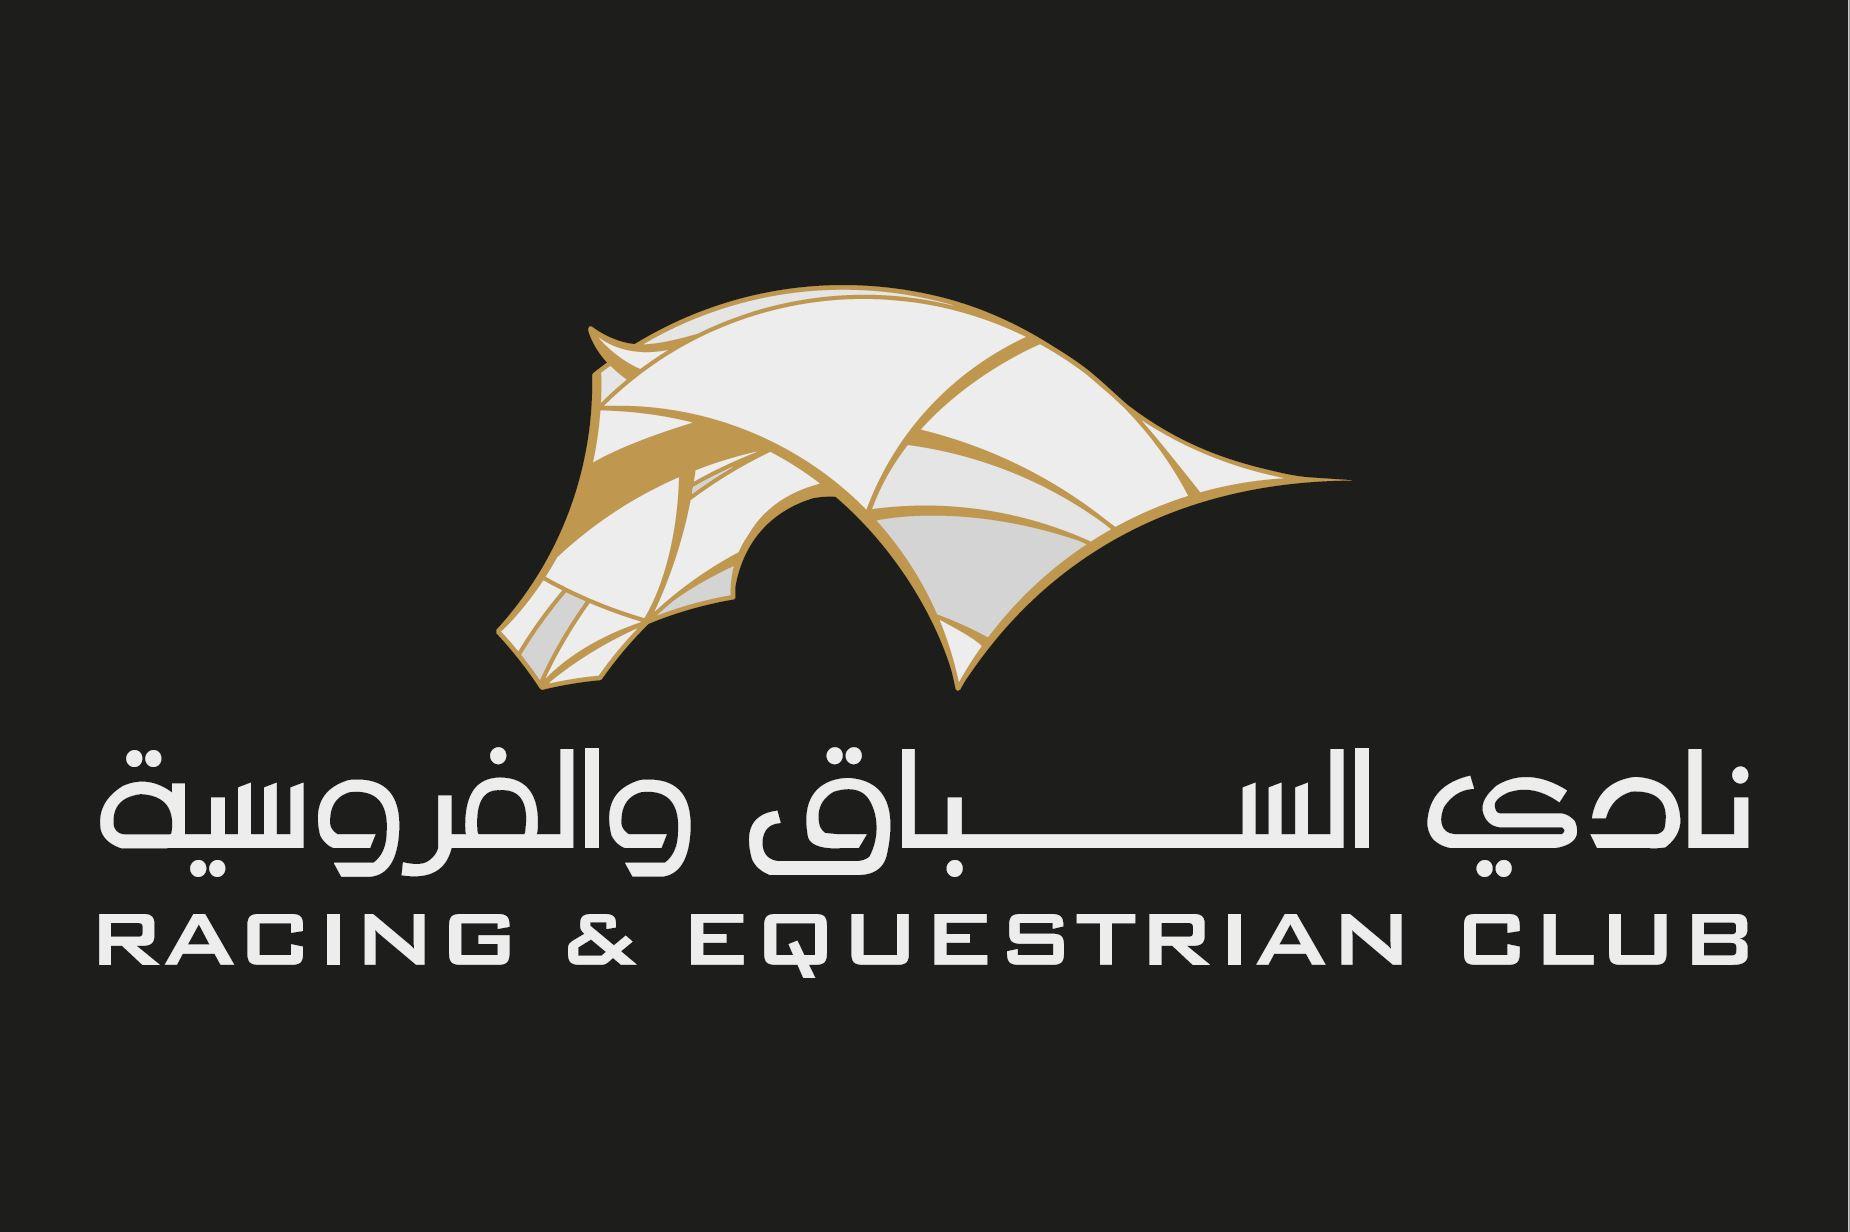 The Qatar Racing And Equestrian Club